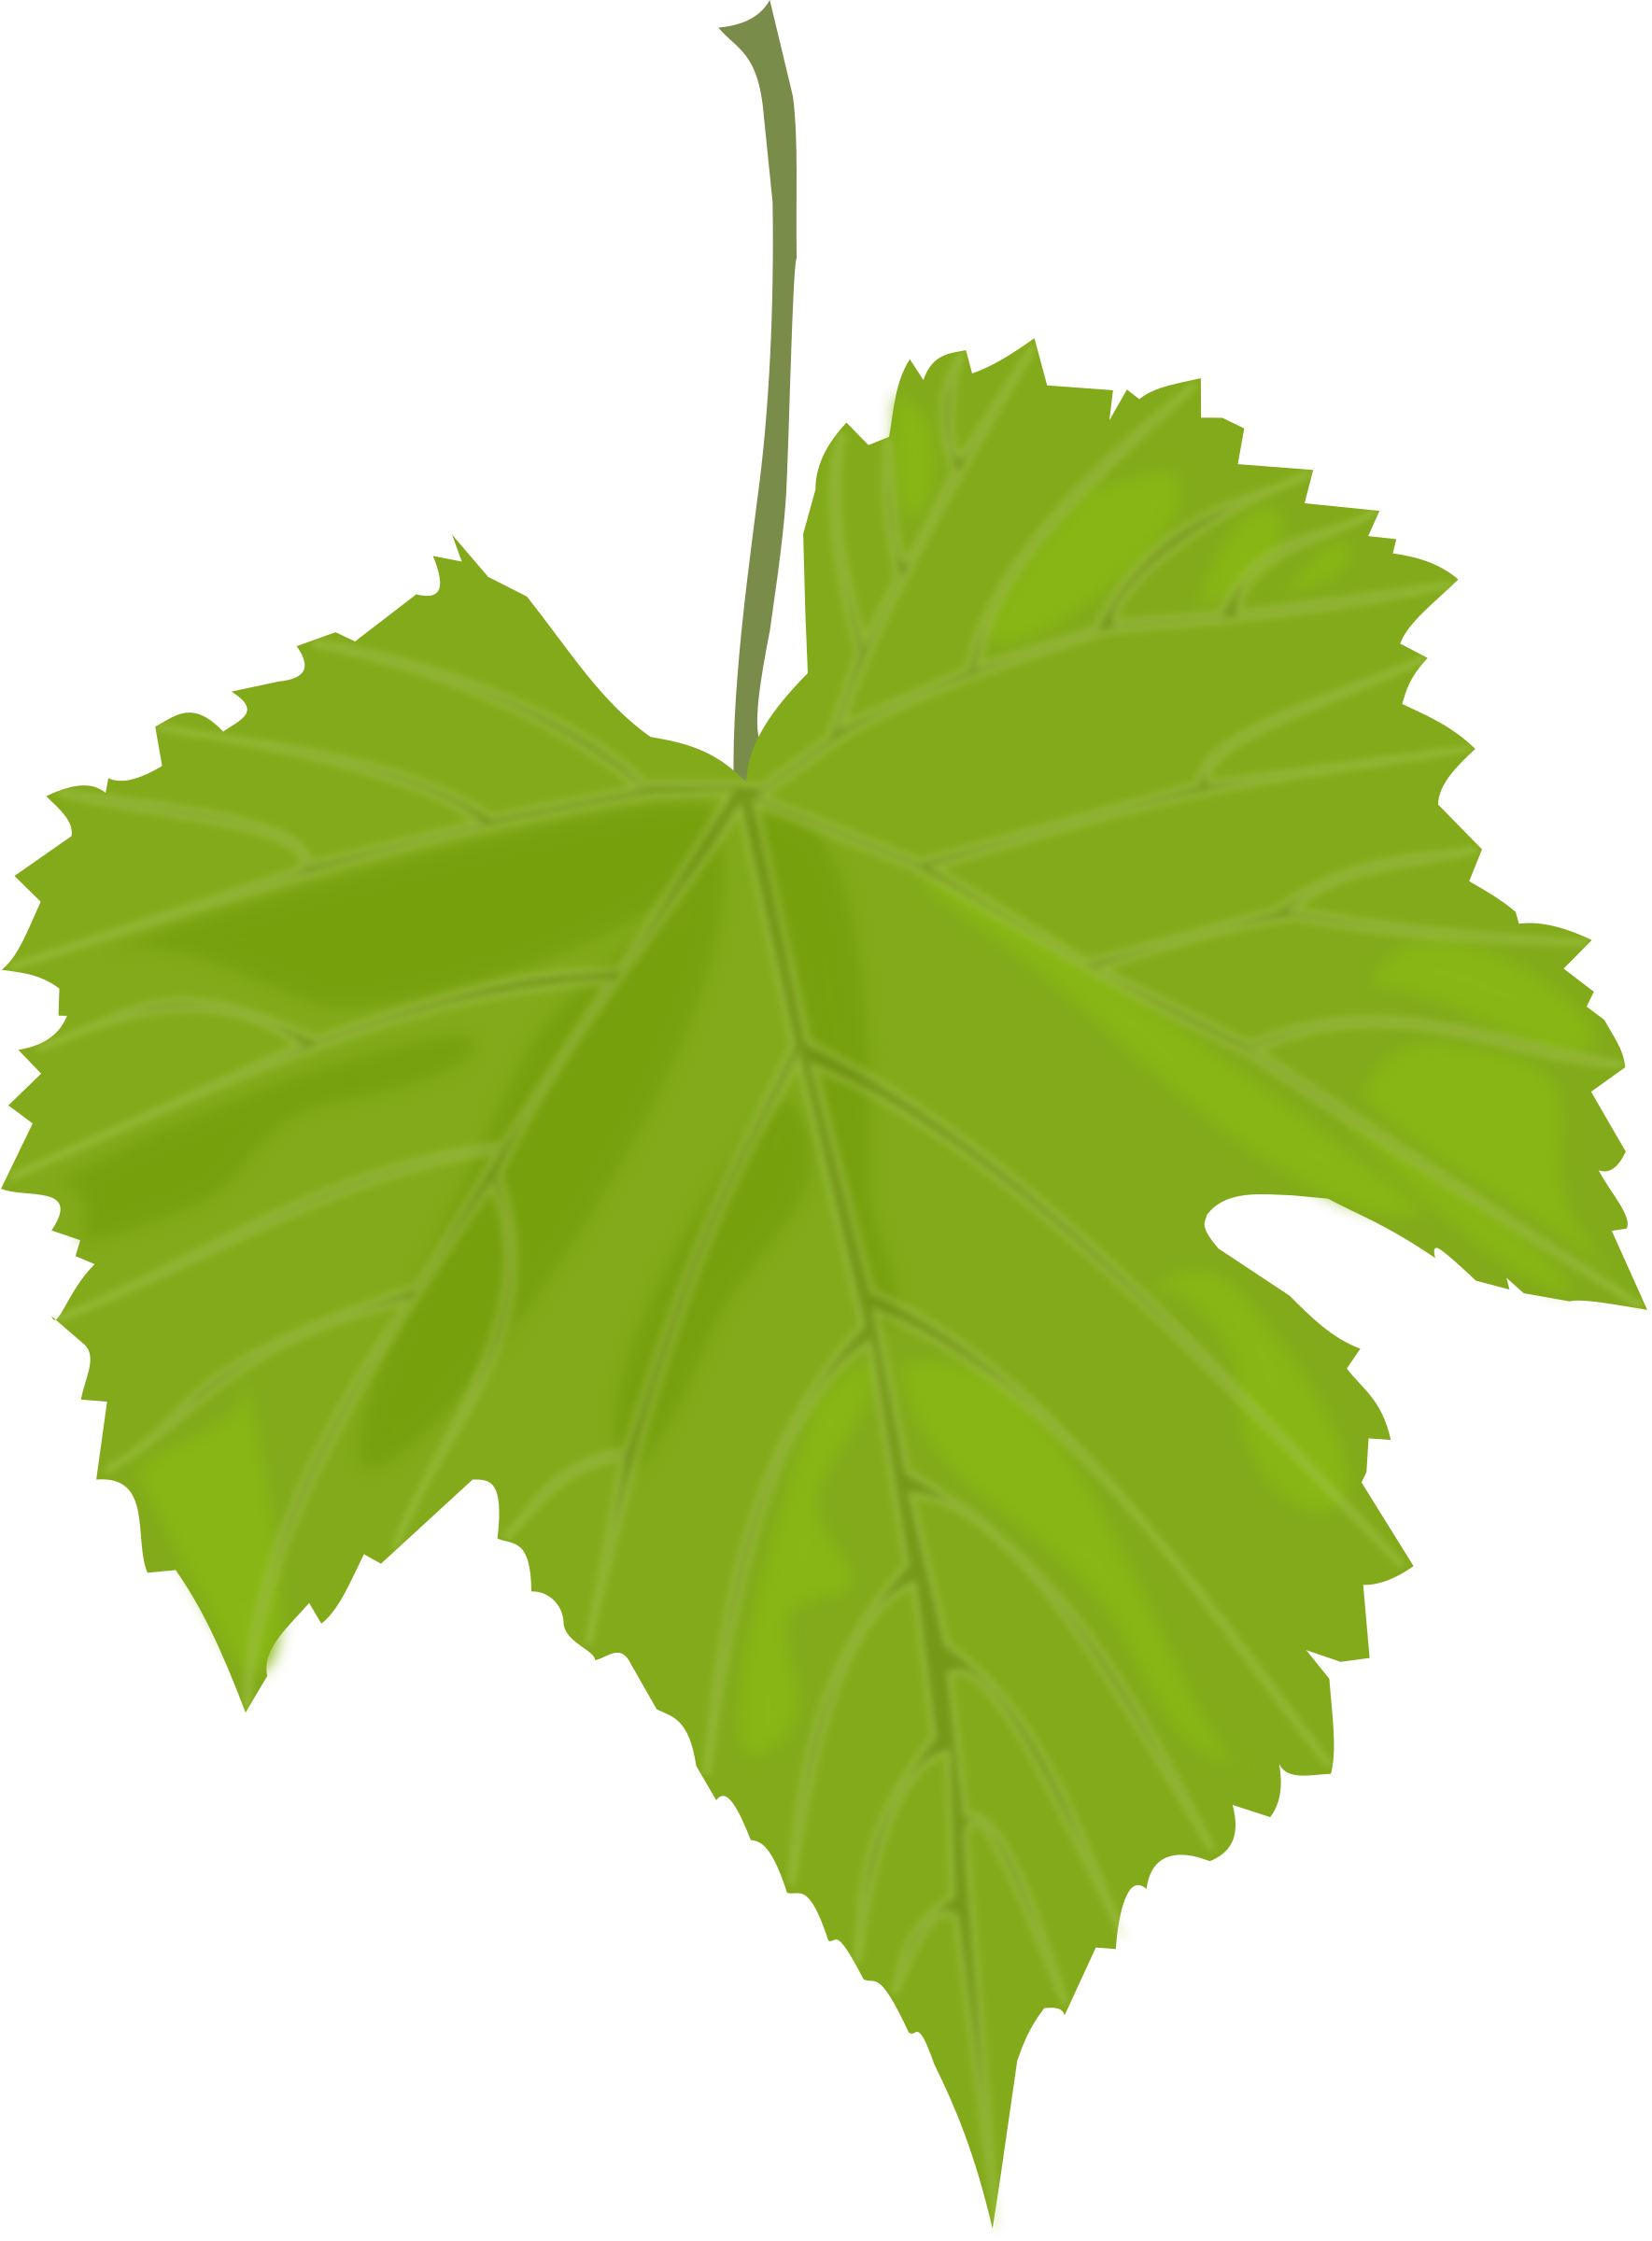 Grape leaf big image. Grapes clipart leaves